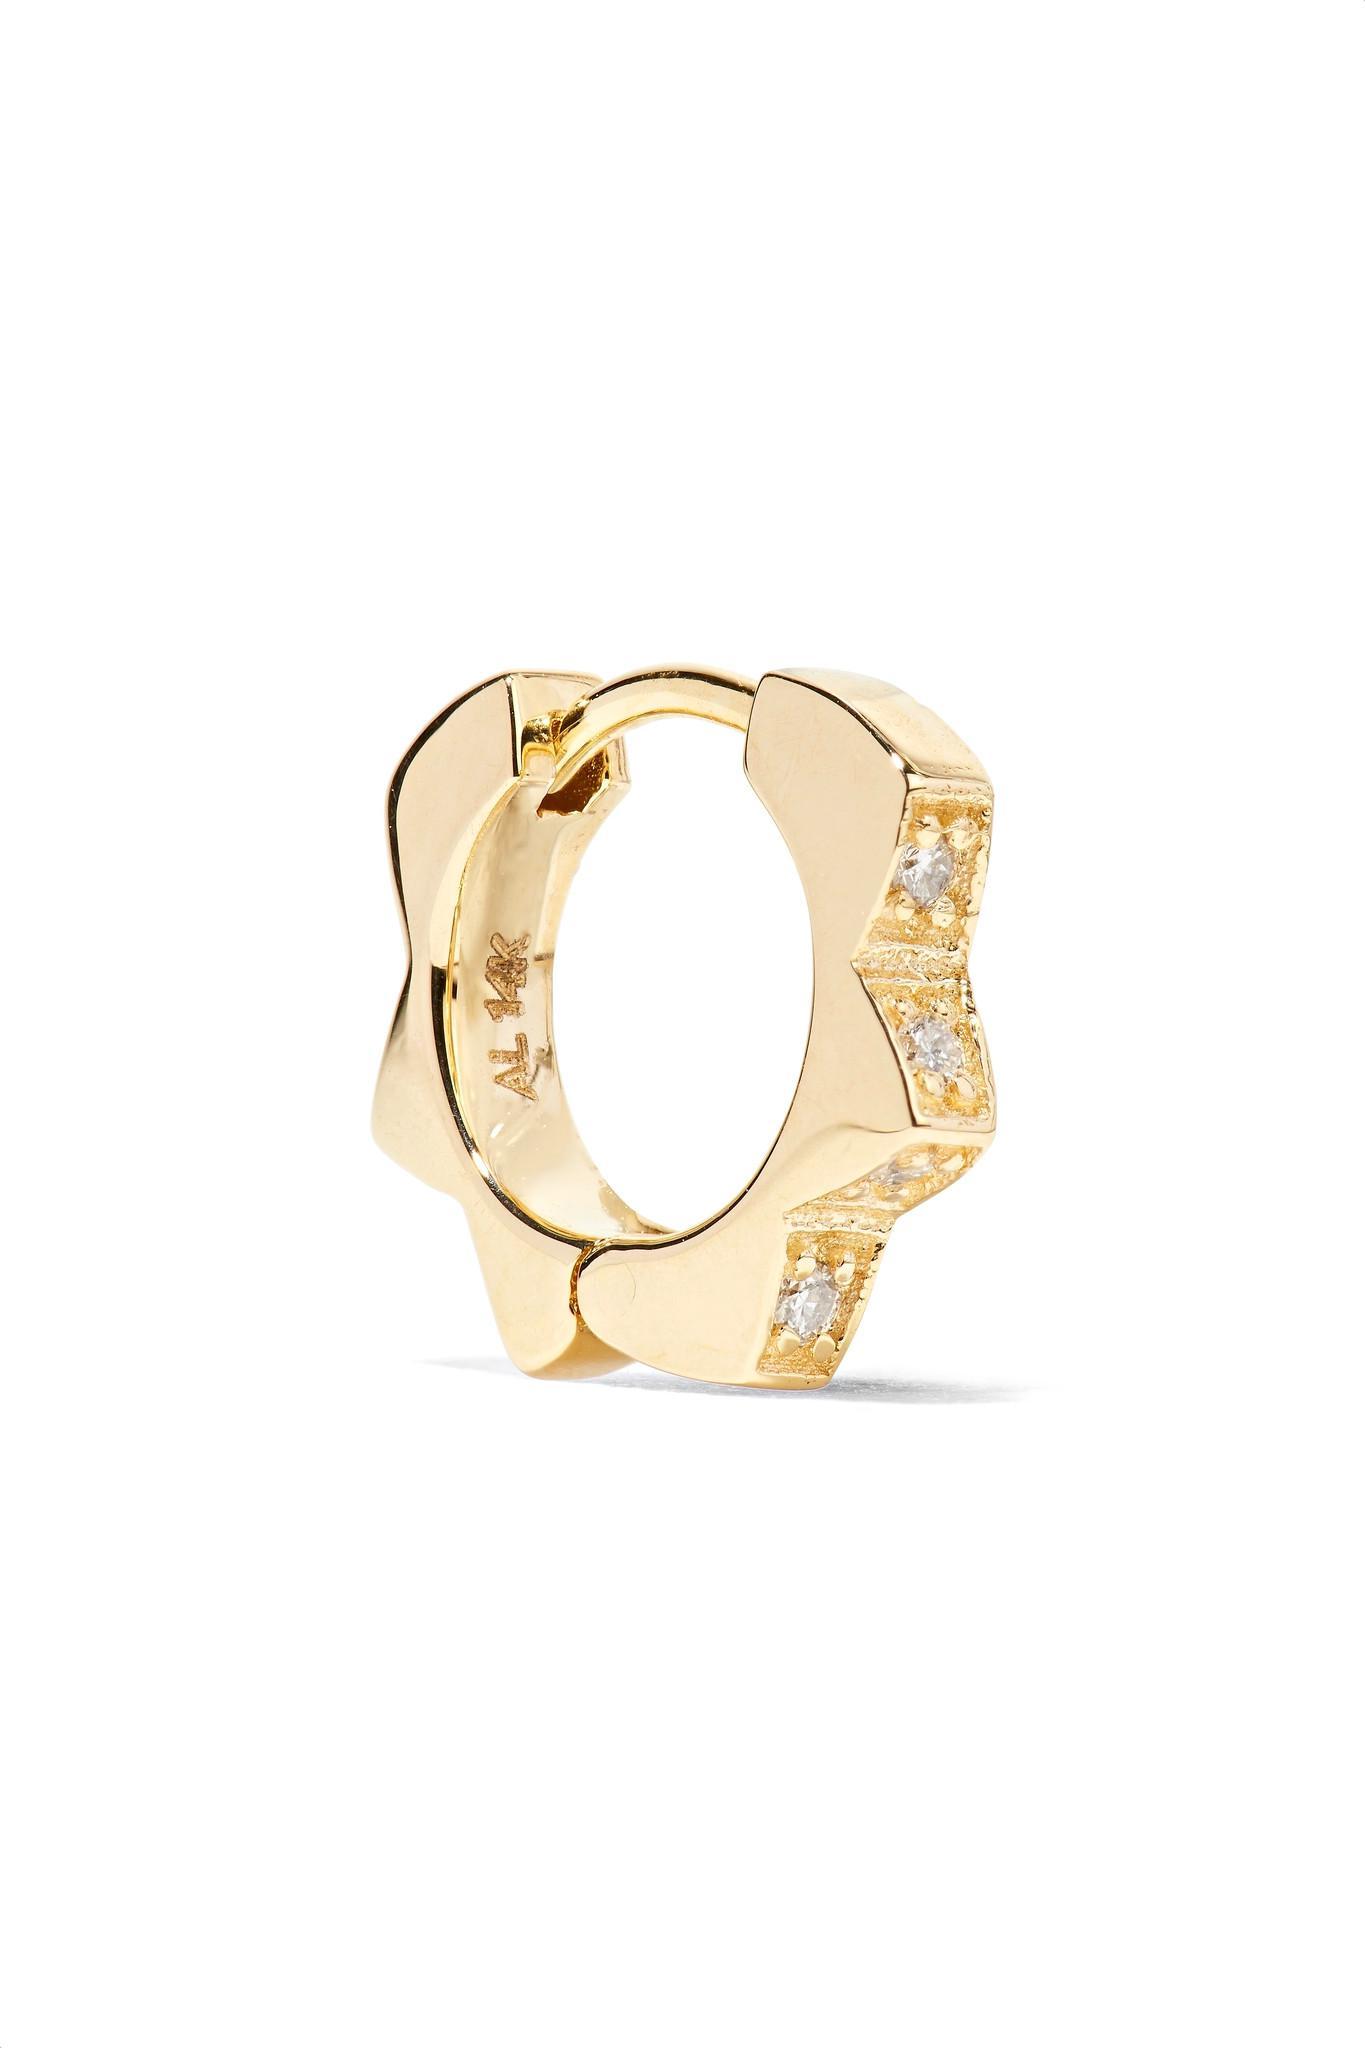 Bowtie Stud 14-karat Gold Earring - one size Alison Lou IRnU2Db3J